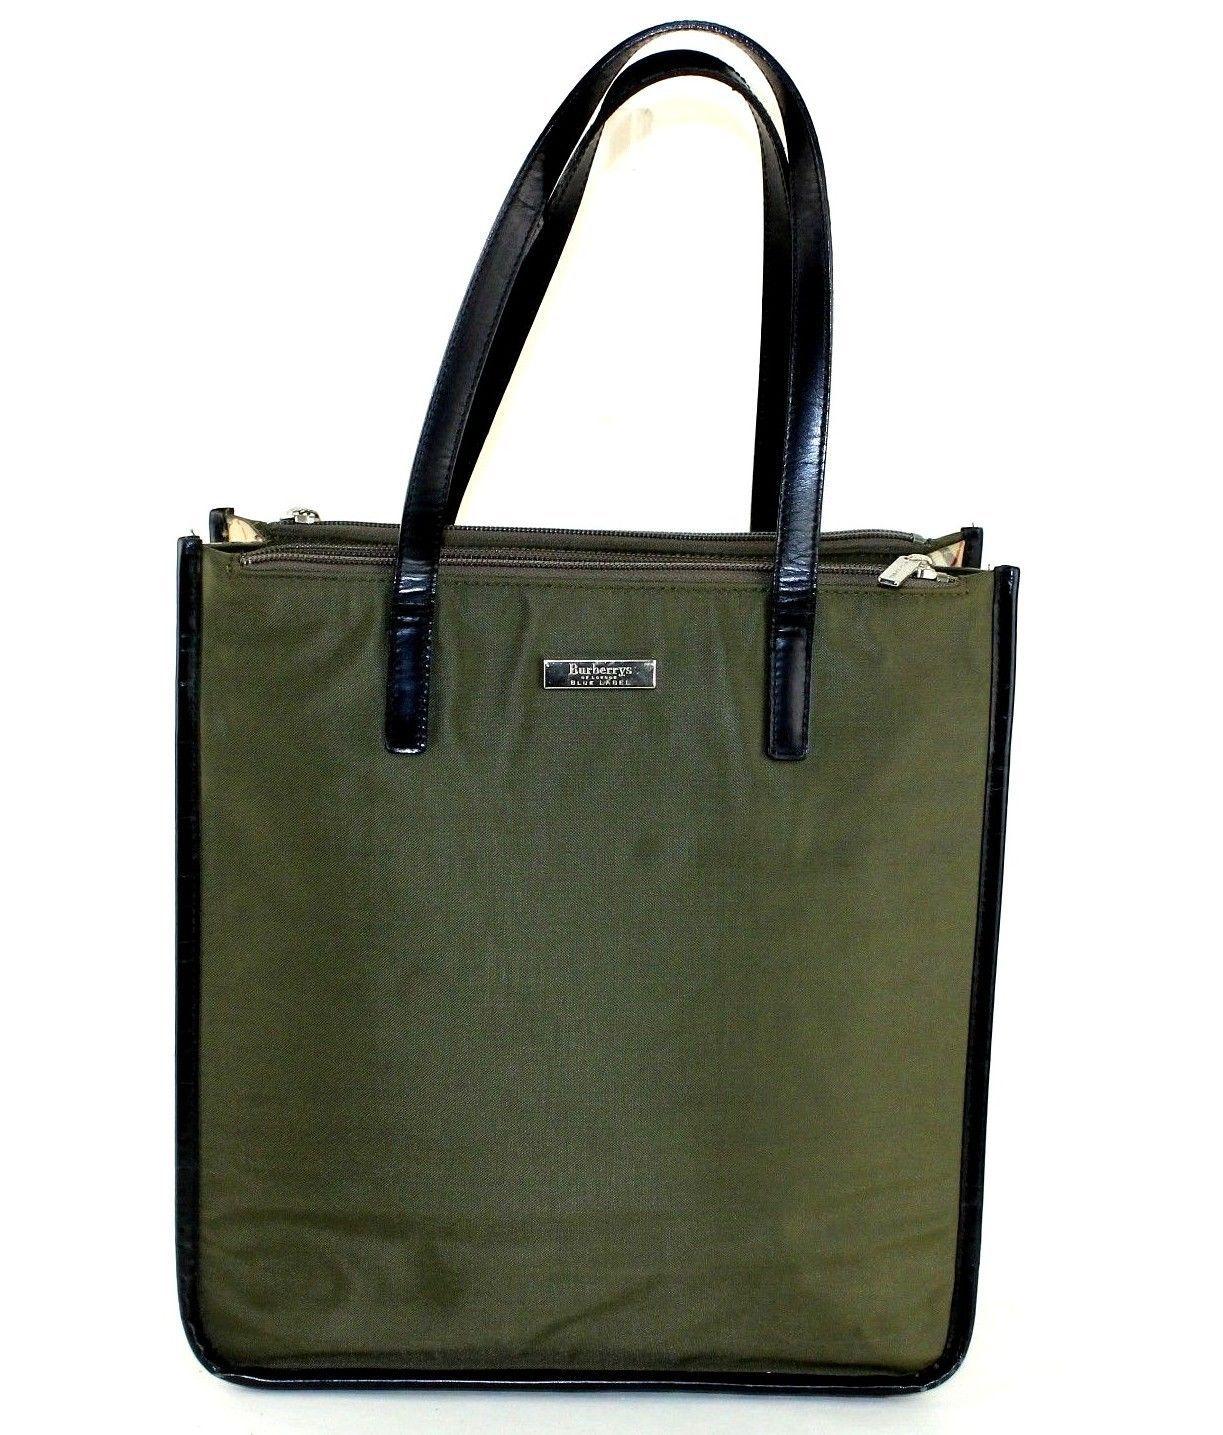 68092c84ceb7 57. 57. Auth Burberrys London Blue Label Olive Nylon Nova Check Tote  Shoulder Hand Bag  Auth Burberrys London Blue ...